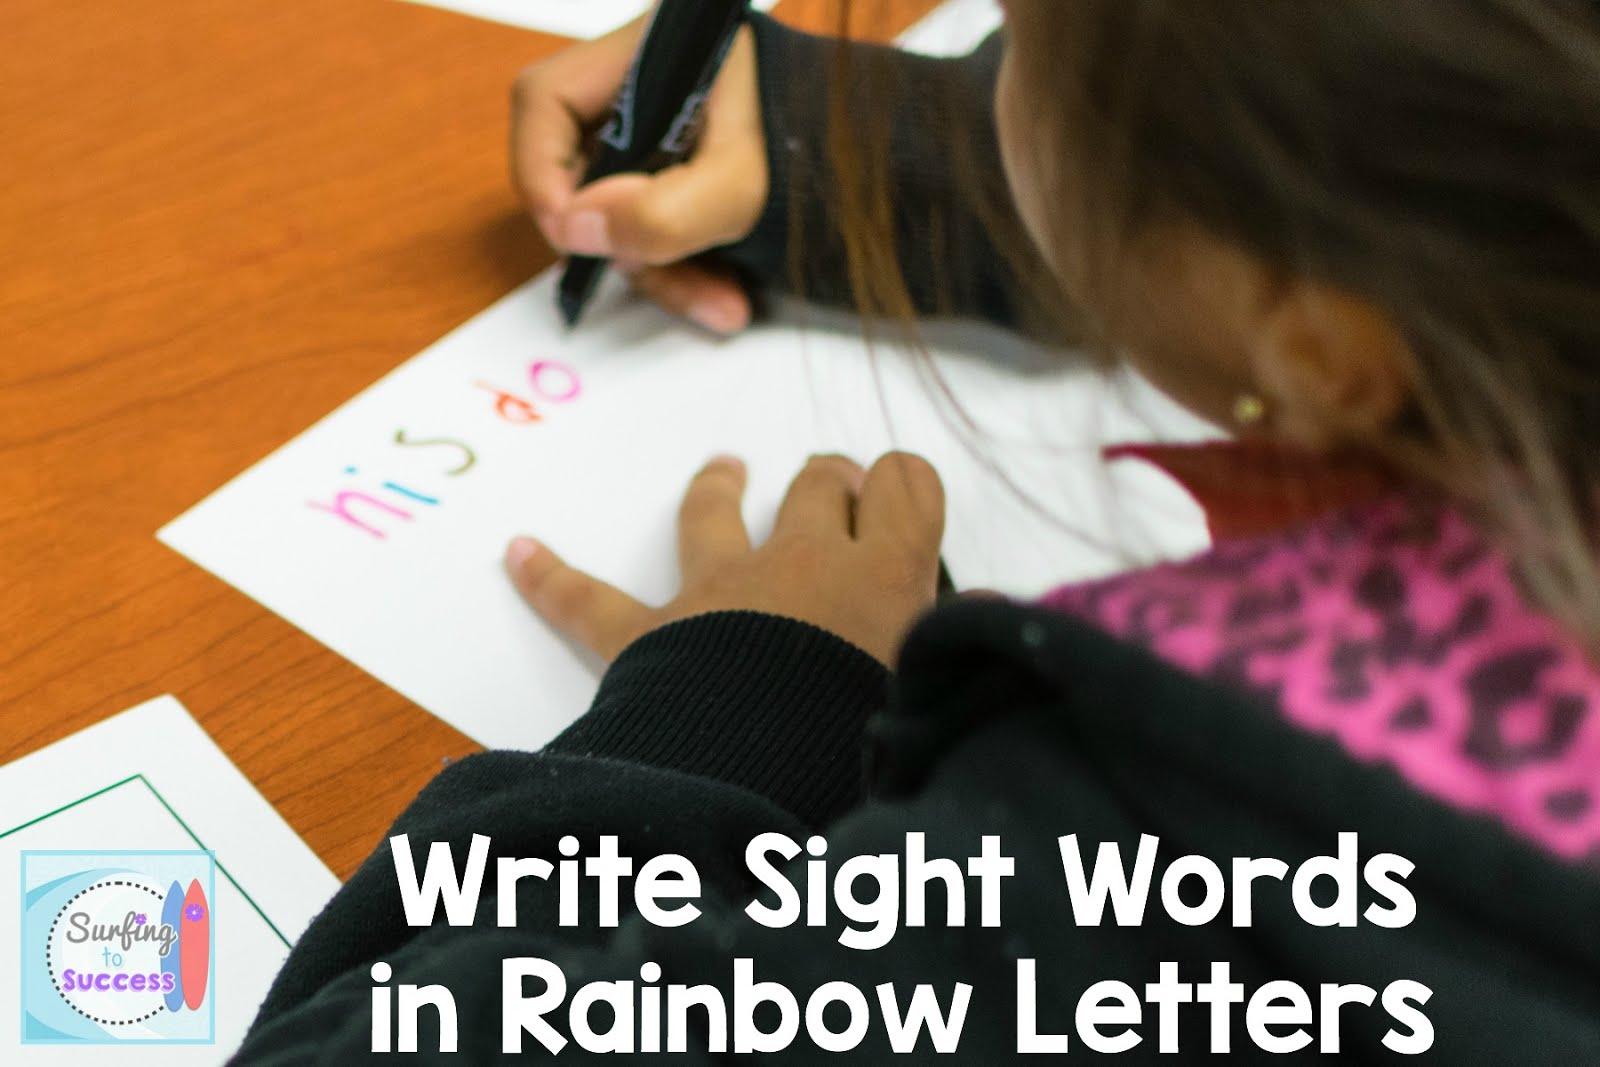 7 Ways To Practice Sight Words